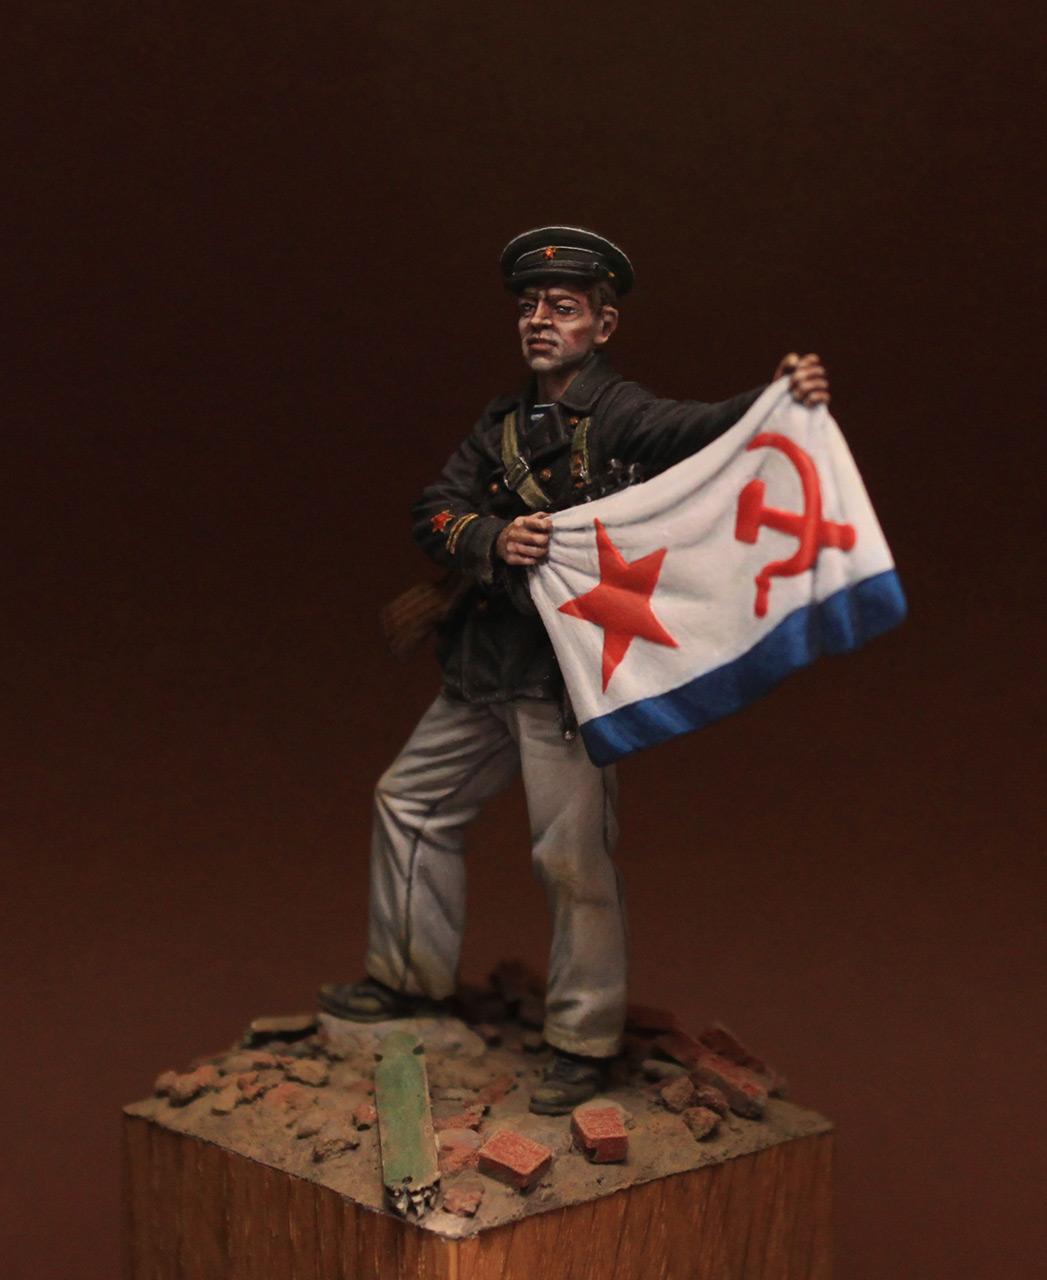 Figures: Petty officer 1st class, Soviet marines, 1942, photo #8